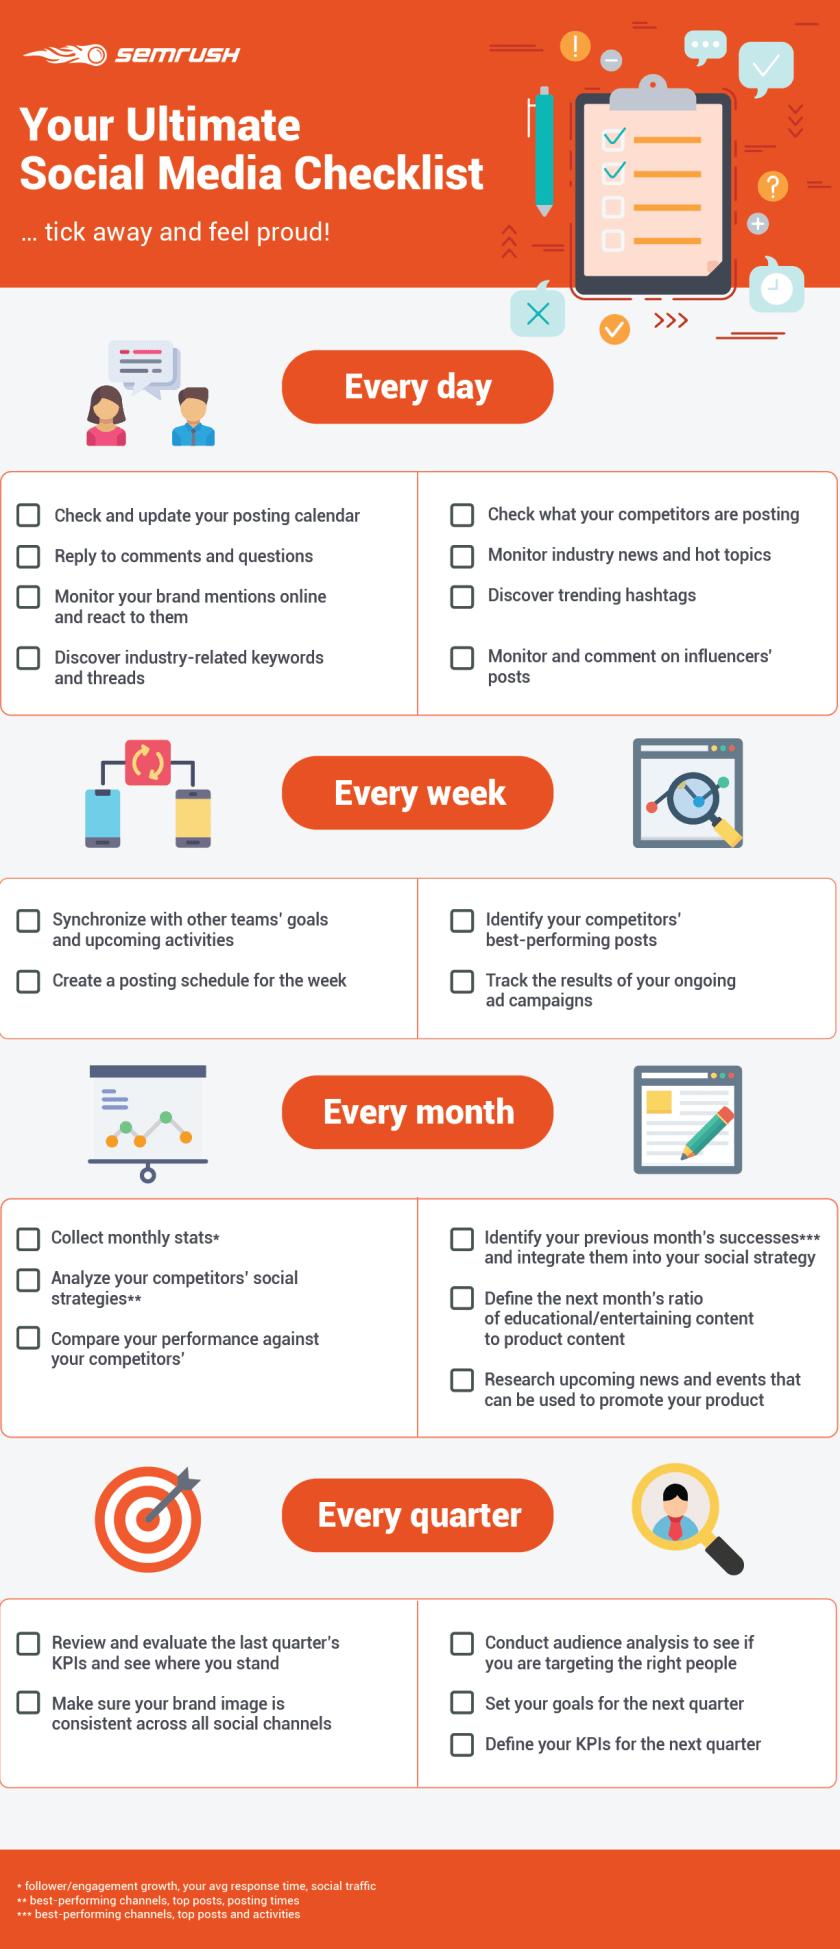 Build a Social Media Checklist